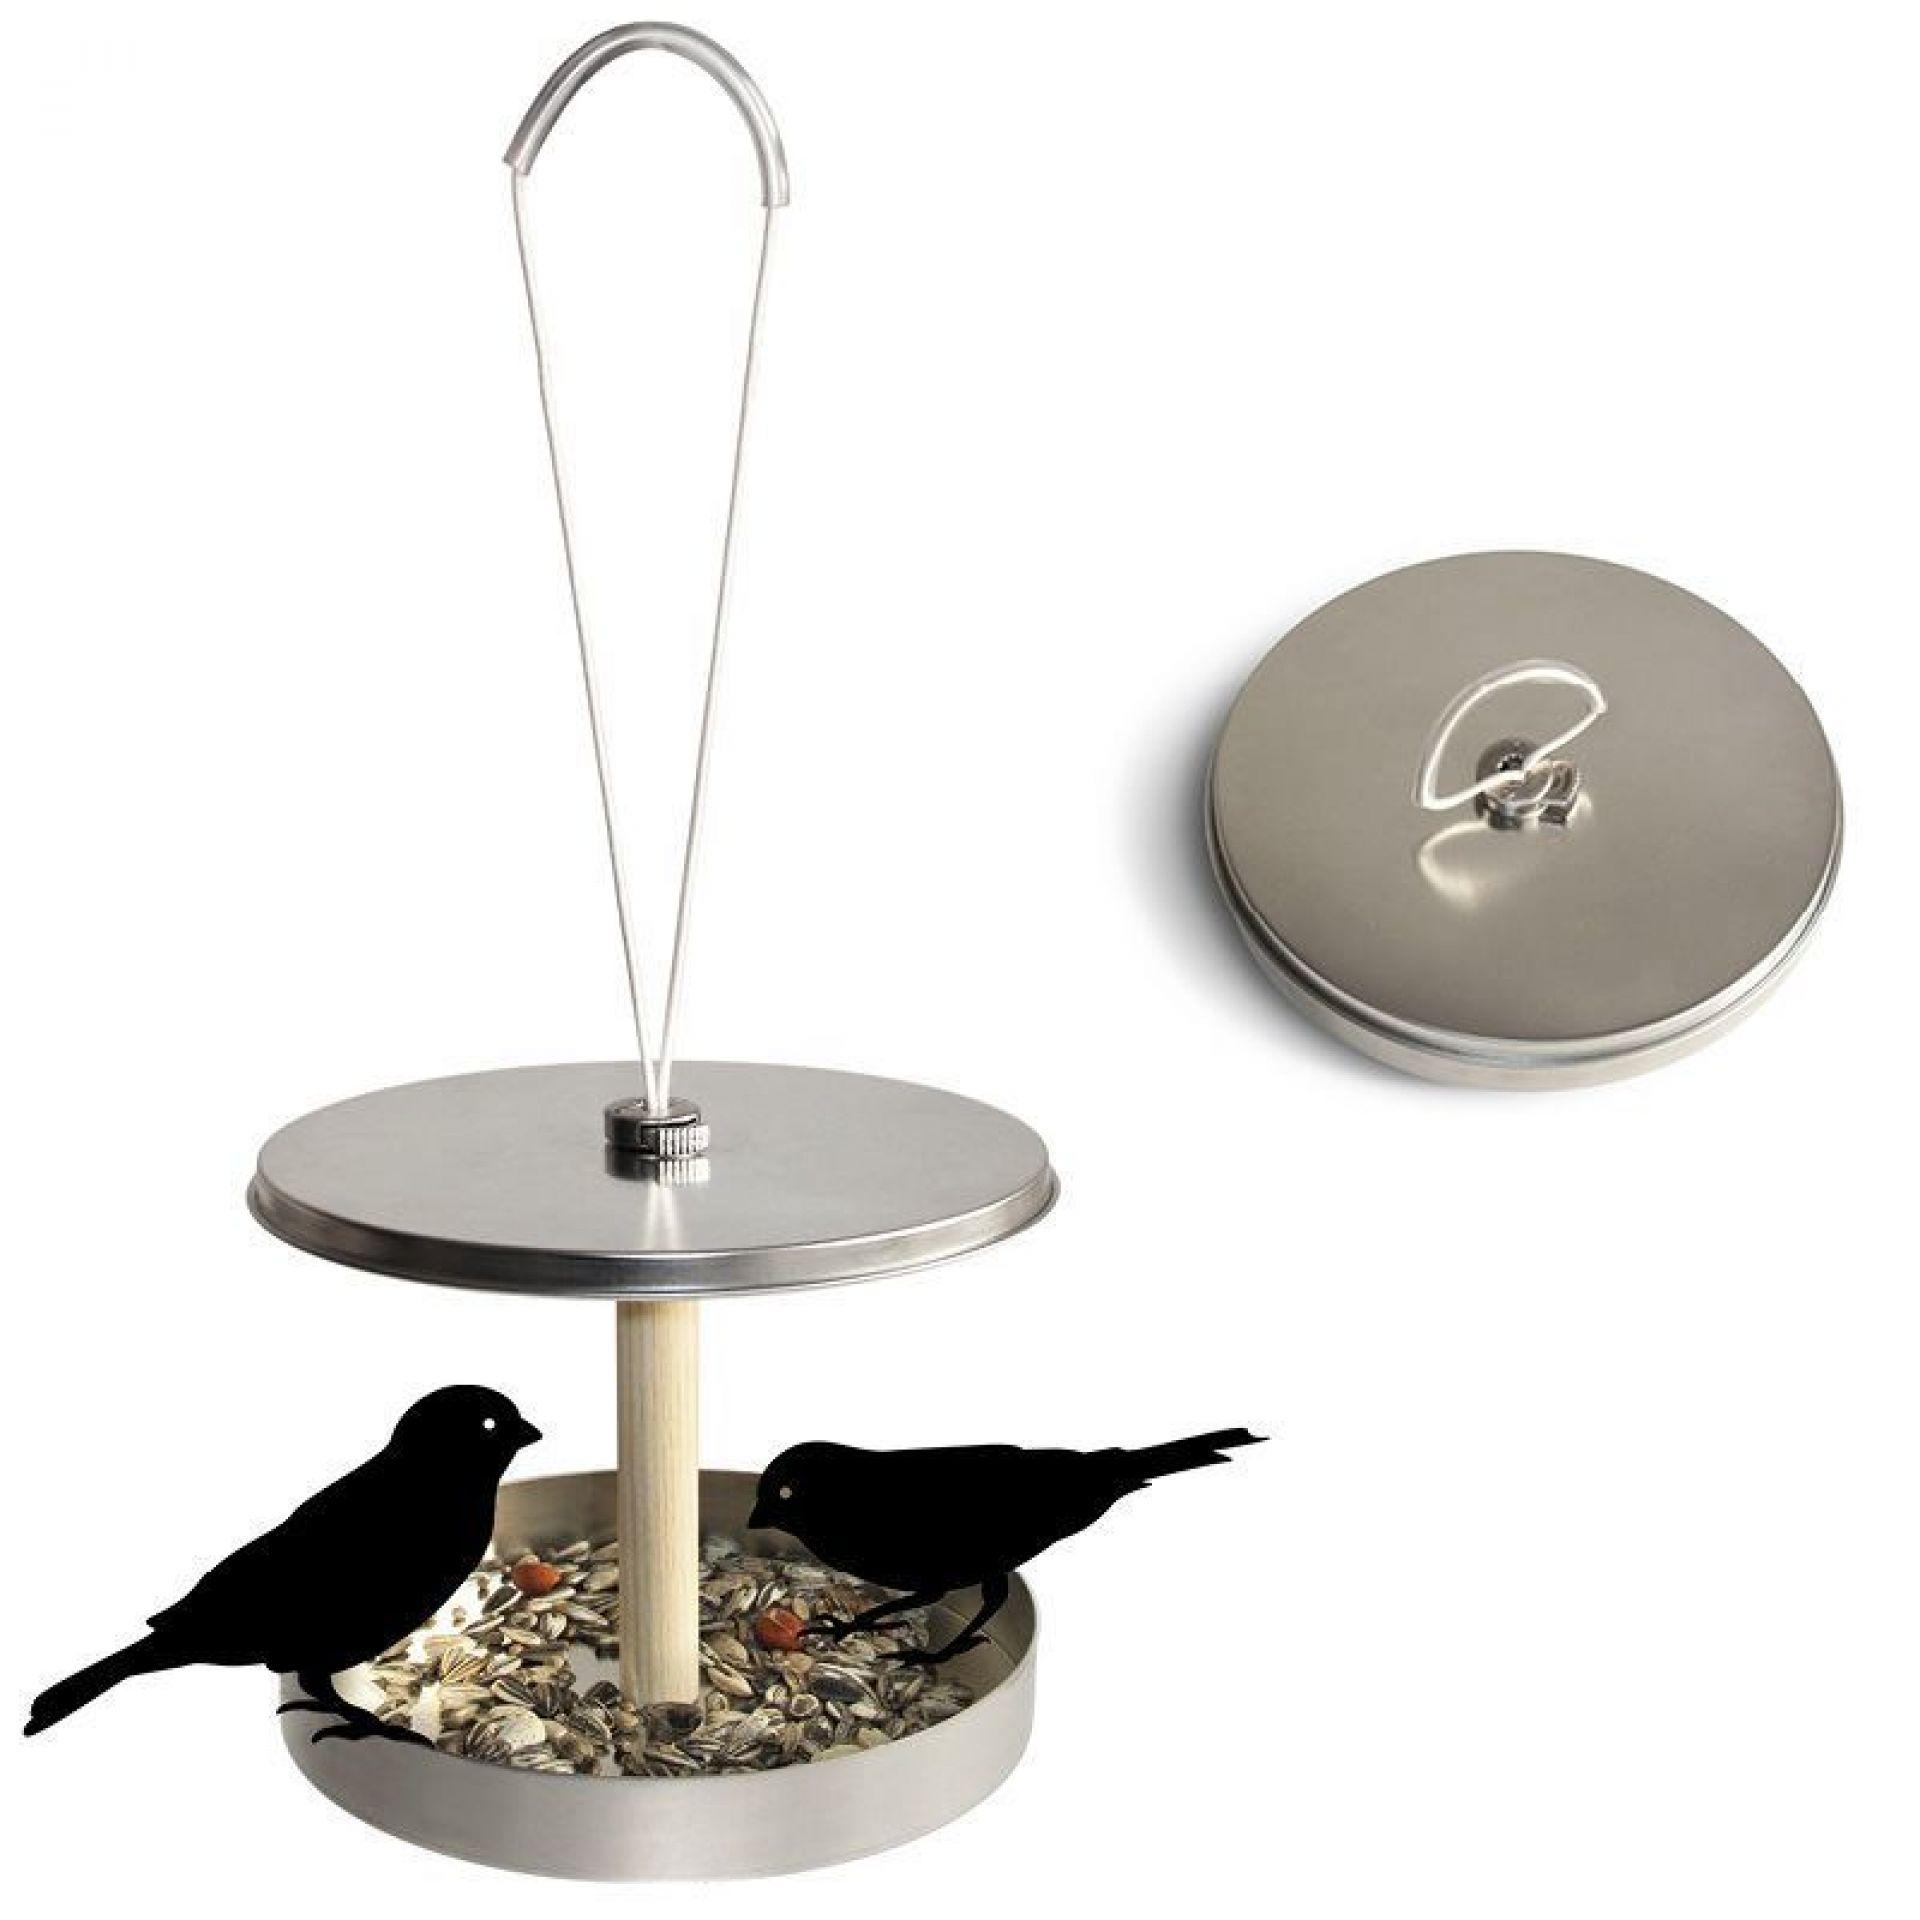 Vogelhaus Birdi to go Side by Side